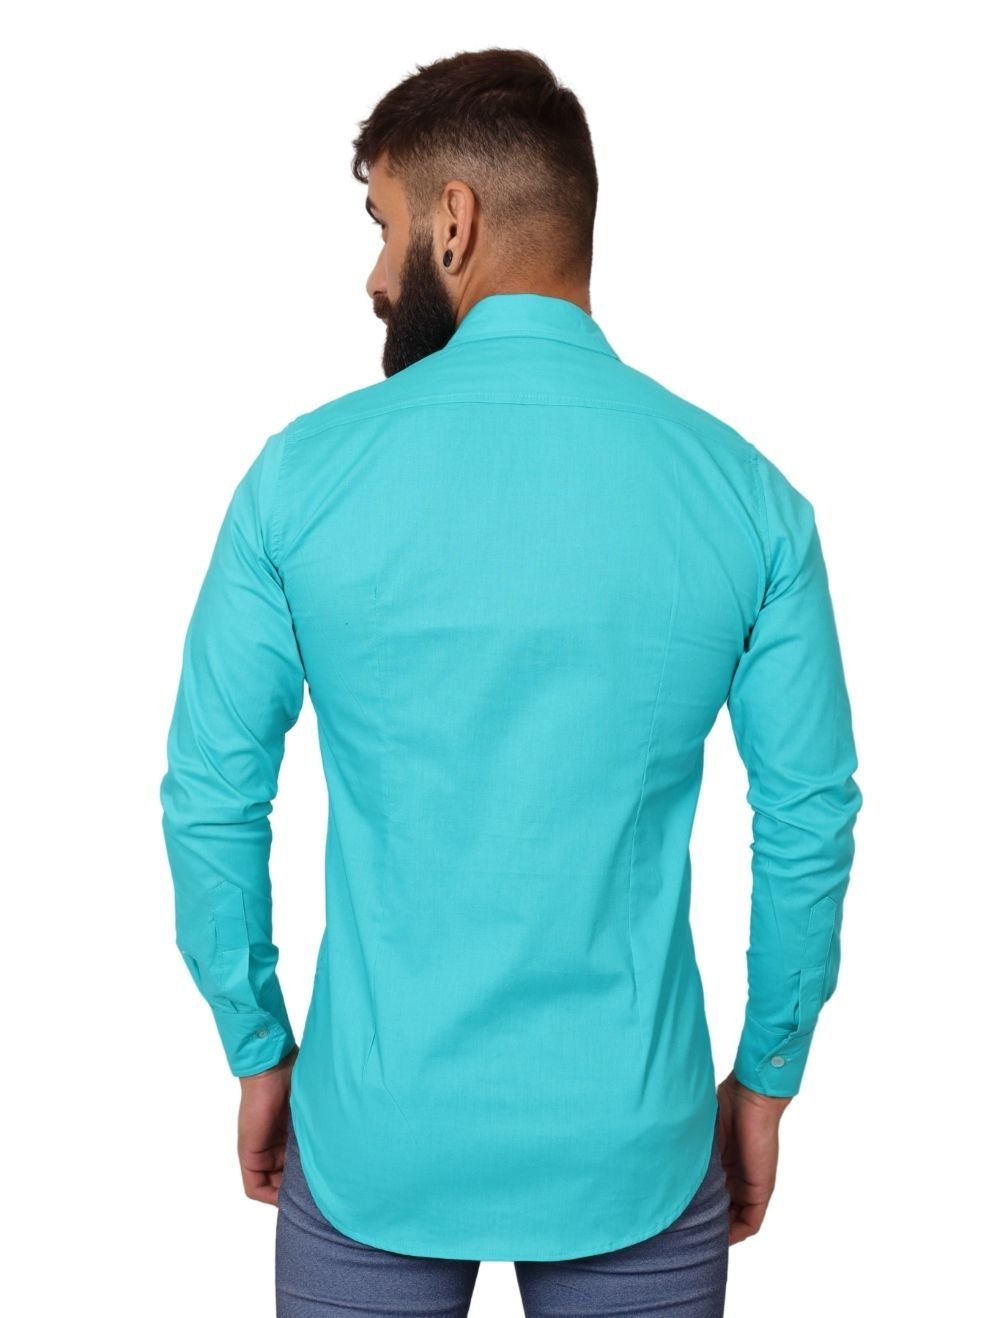 Camisa Masculina Slim Manga Longa com Elastano Azul